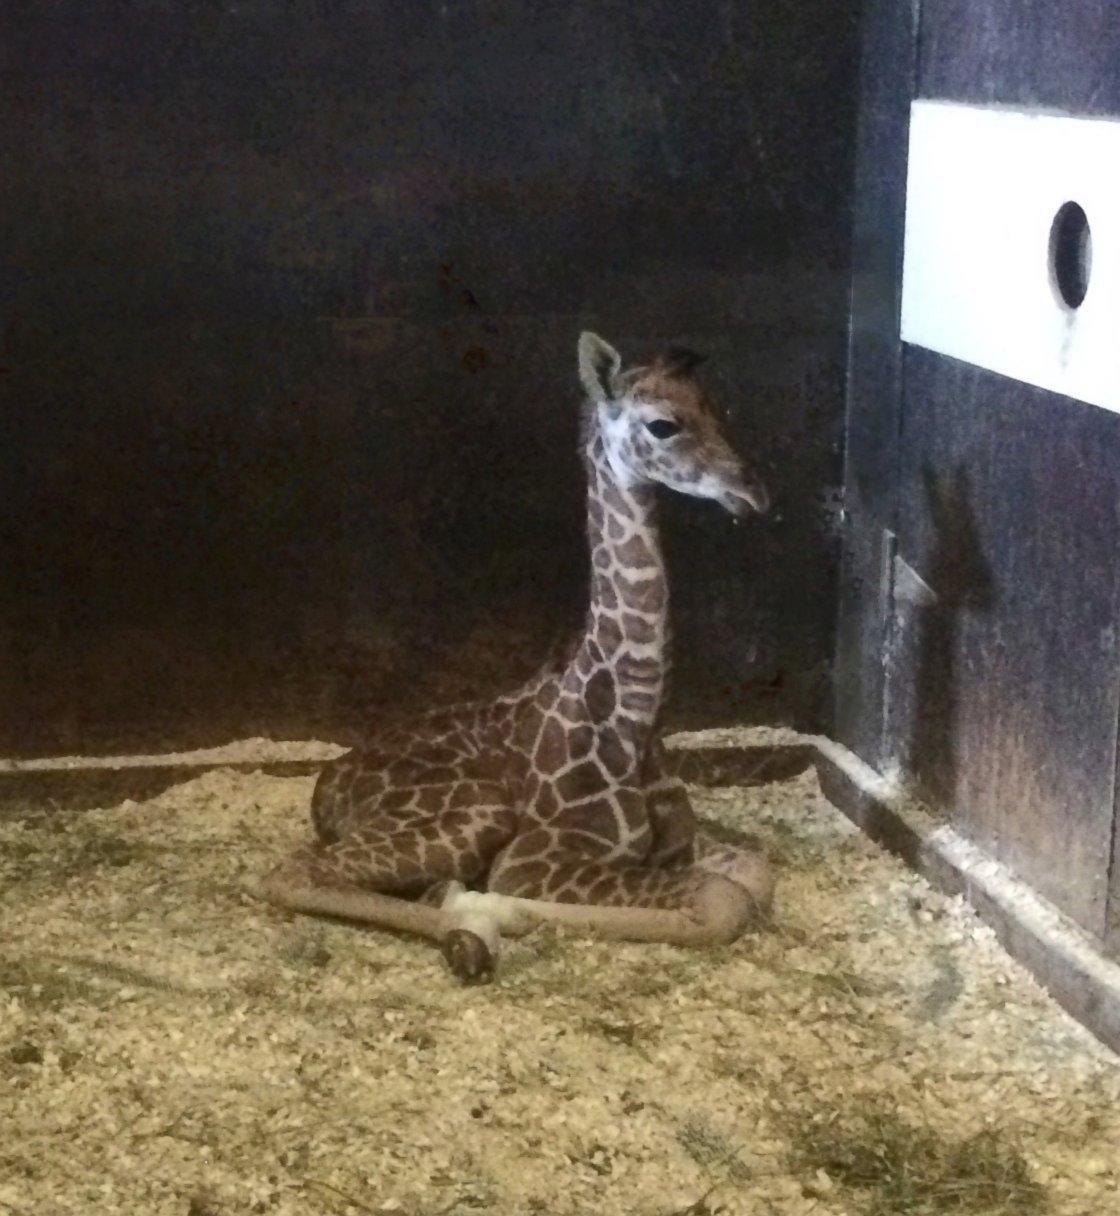 A Baby Giraffe Joins Six Flags Great Adventure's Safari